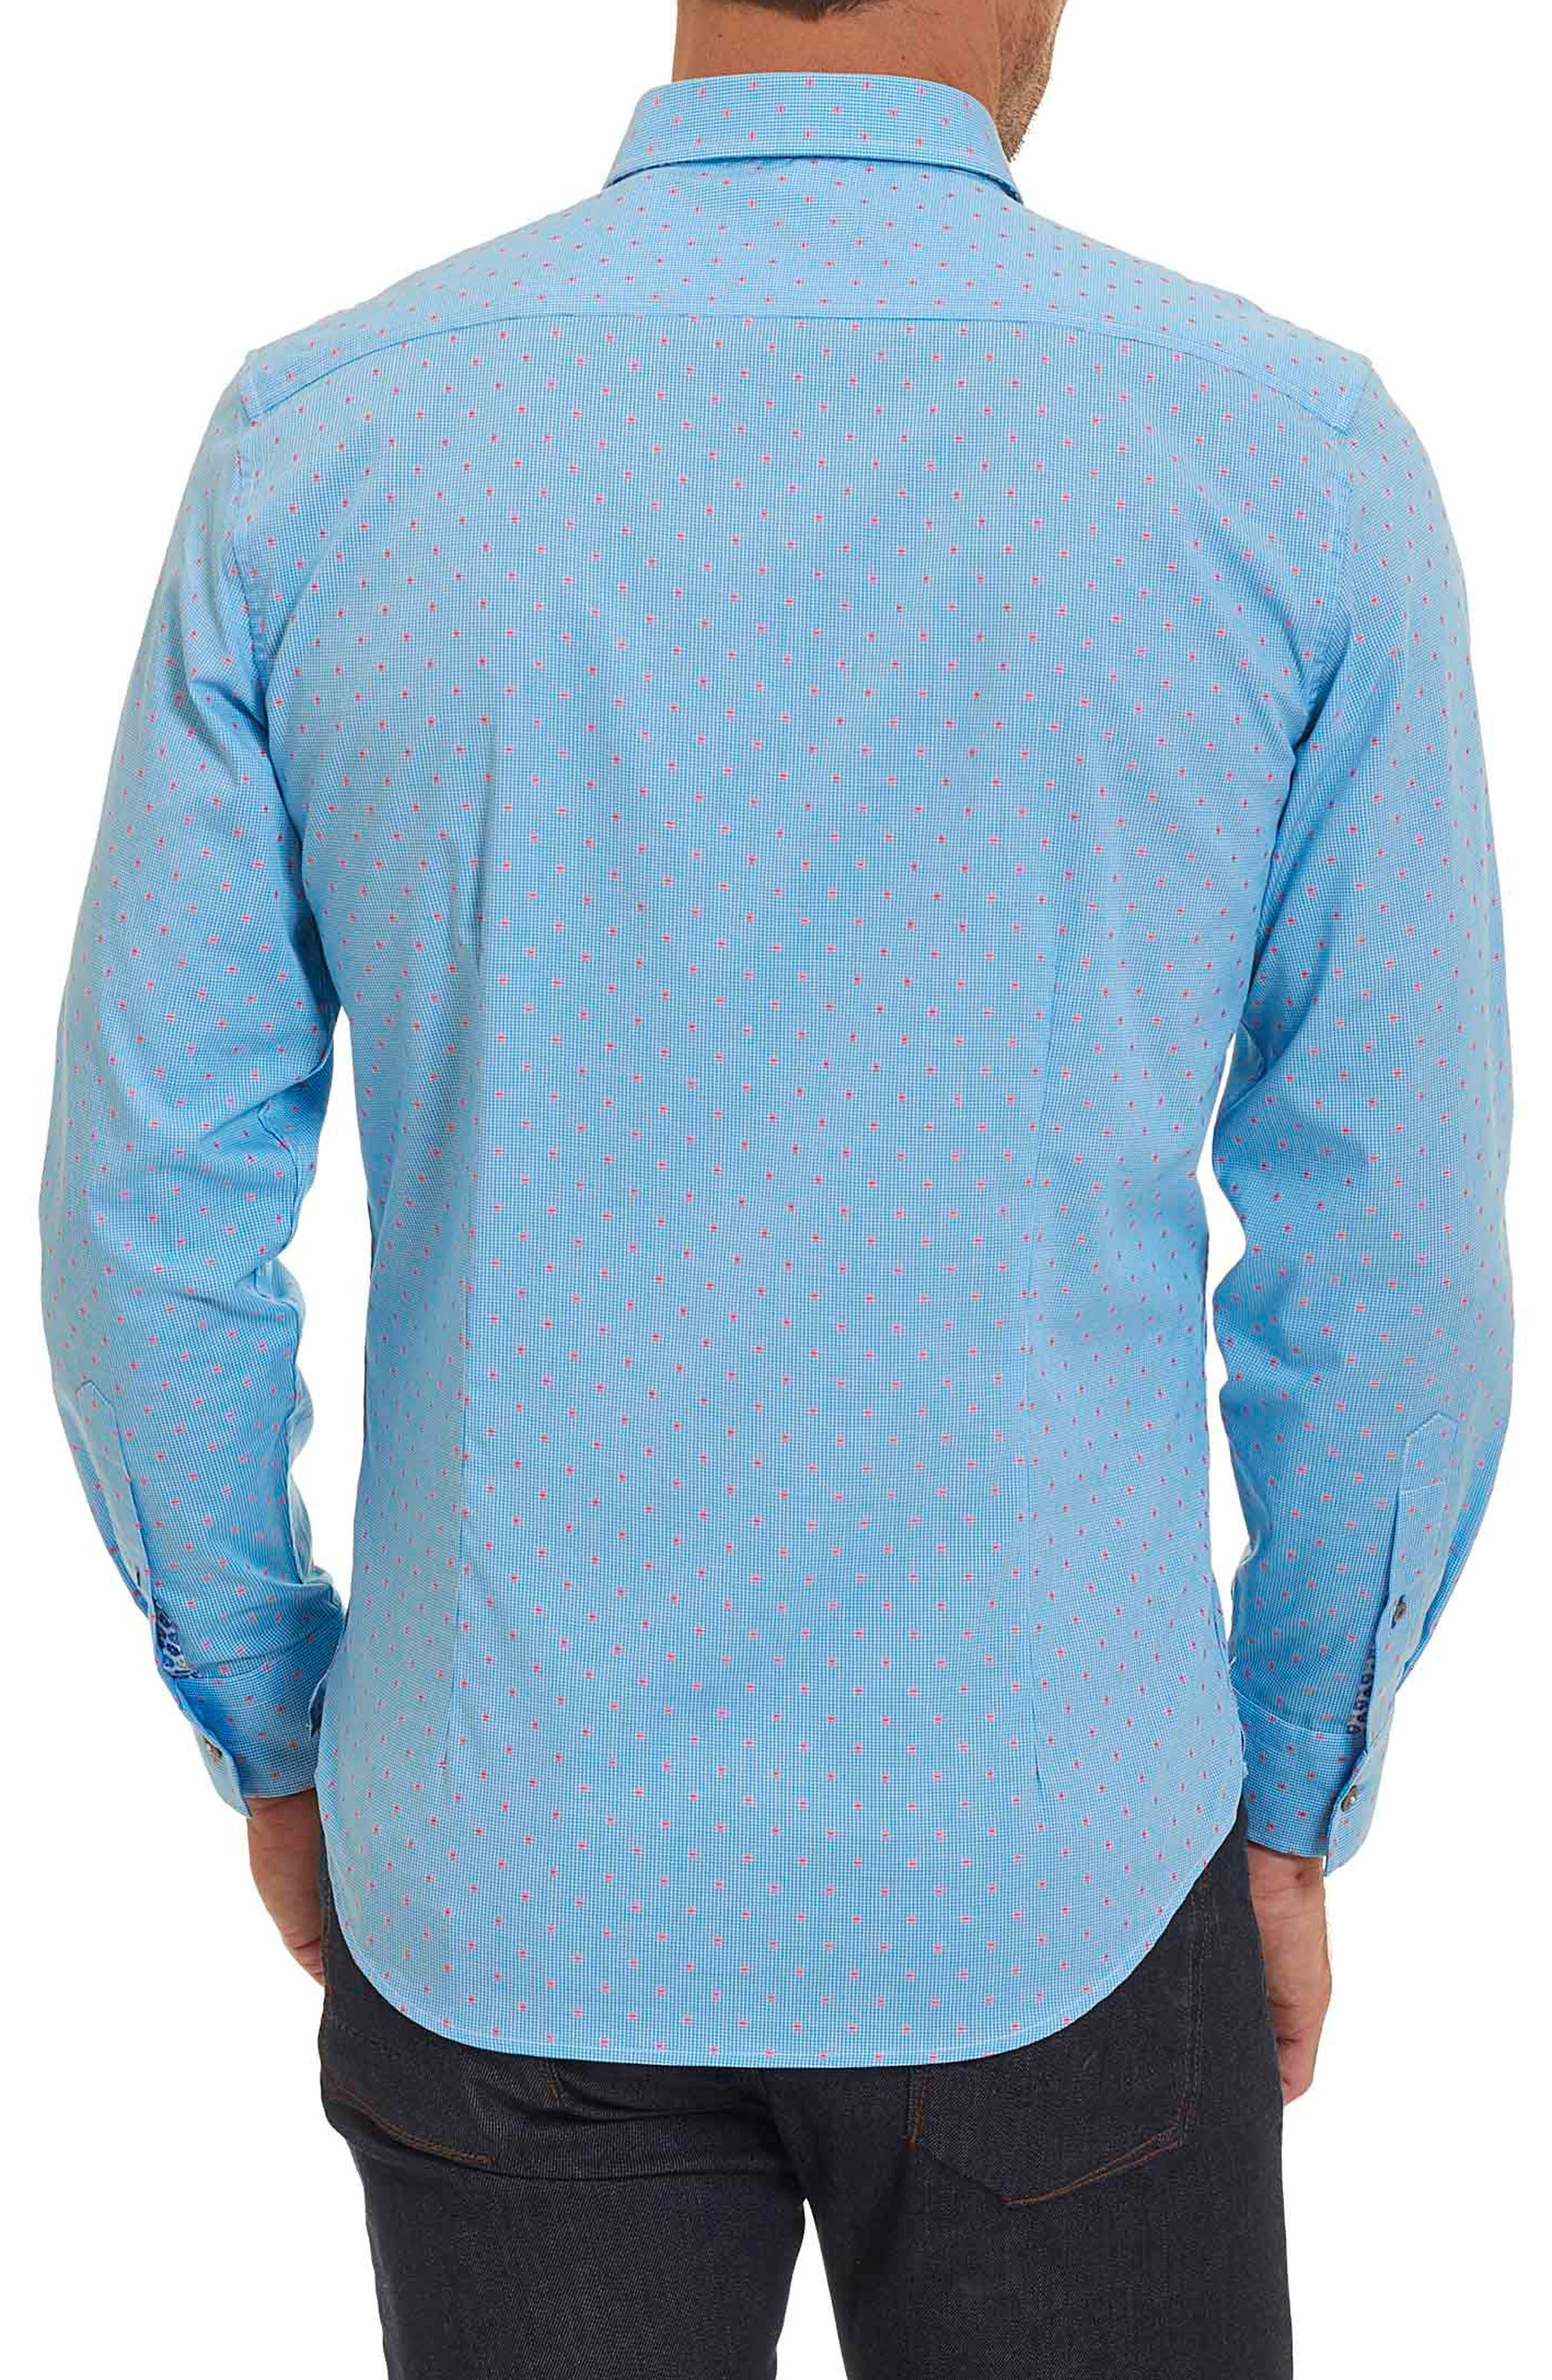 Carlos Tailored Fit Sport Shirt,                             Alternate thumbnail 2, color,